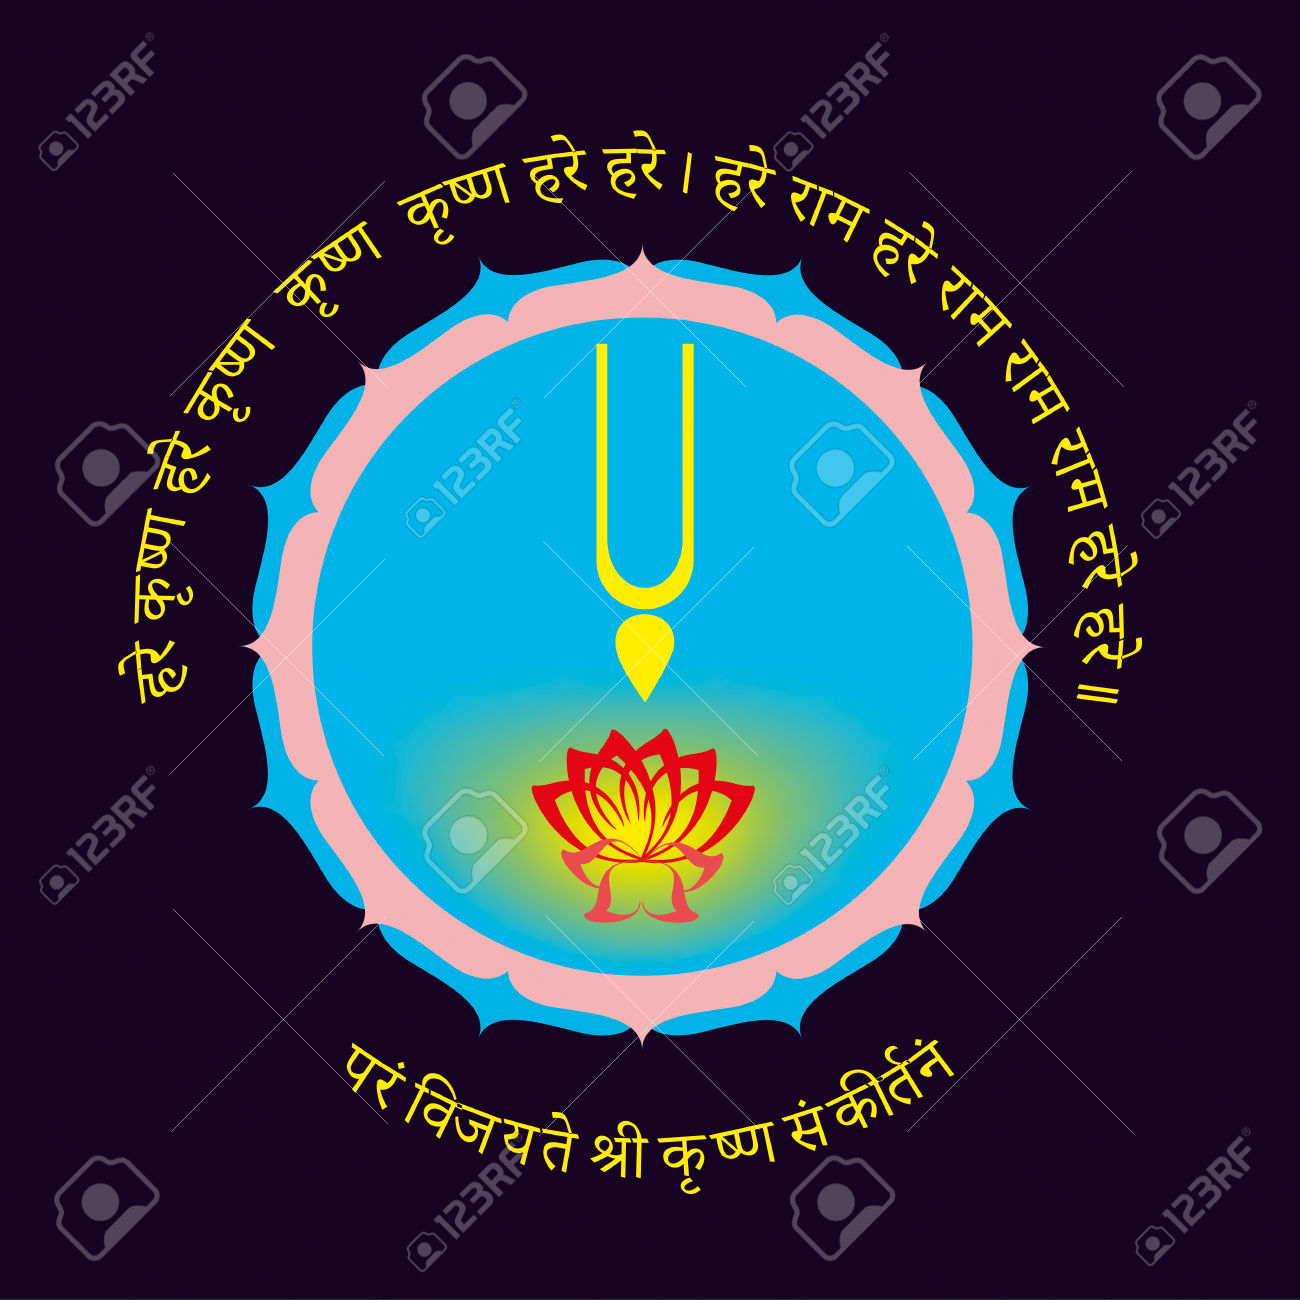 Hare Krishna Mantra Clipart.